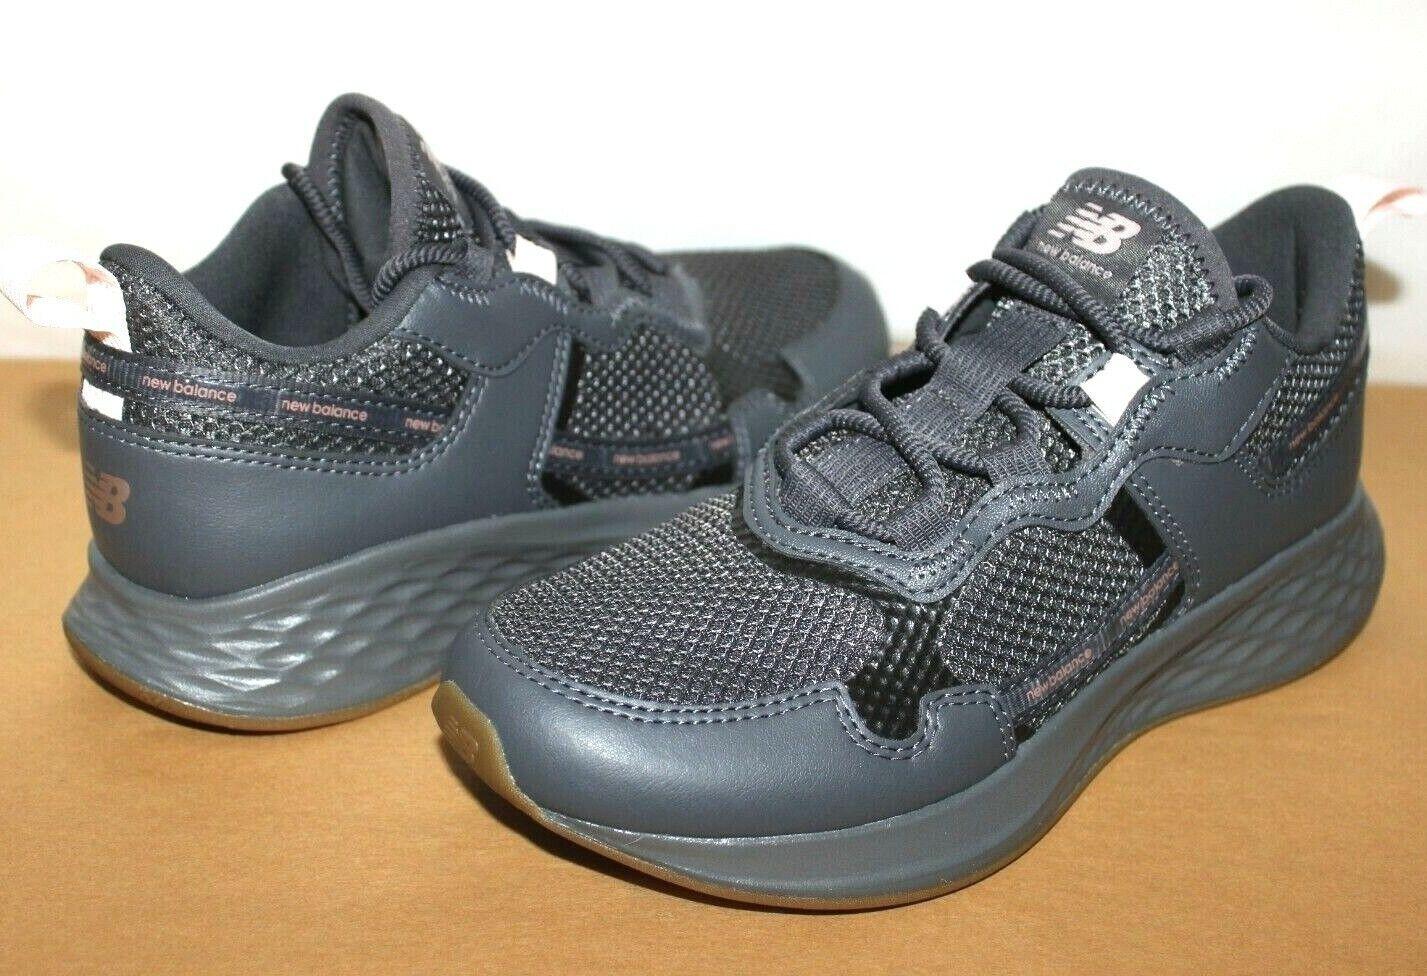 ❤️ New Balance Roav-Hi Frais Mousse Course Chaussure 7 37.5 Femmes Neuf ! LOOK